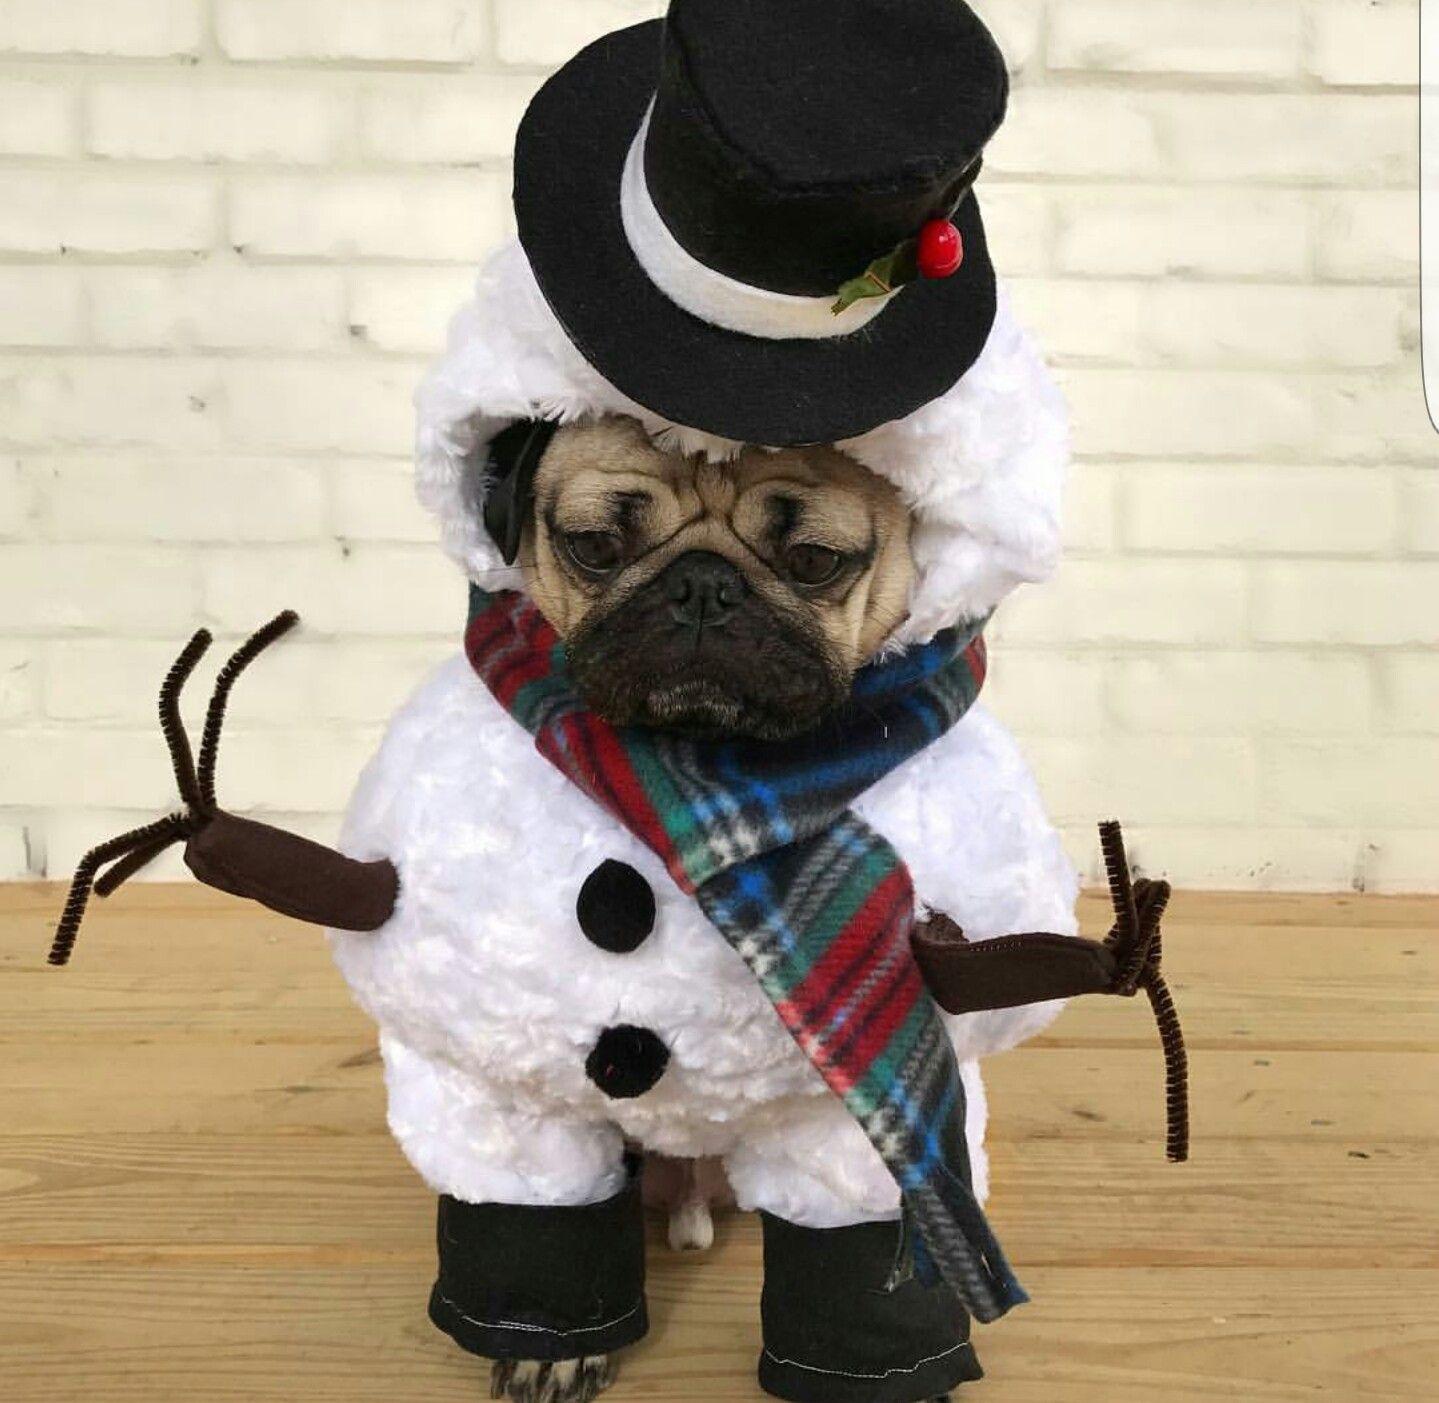 Snow Pugg